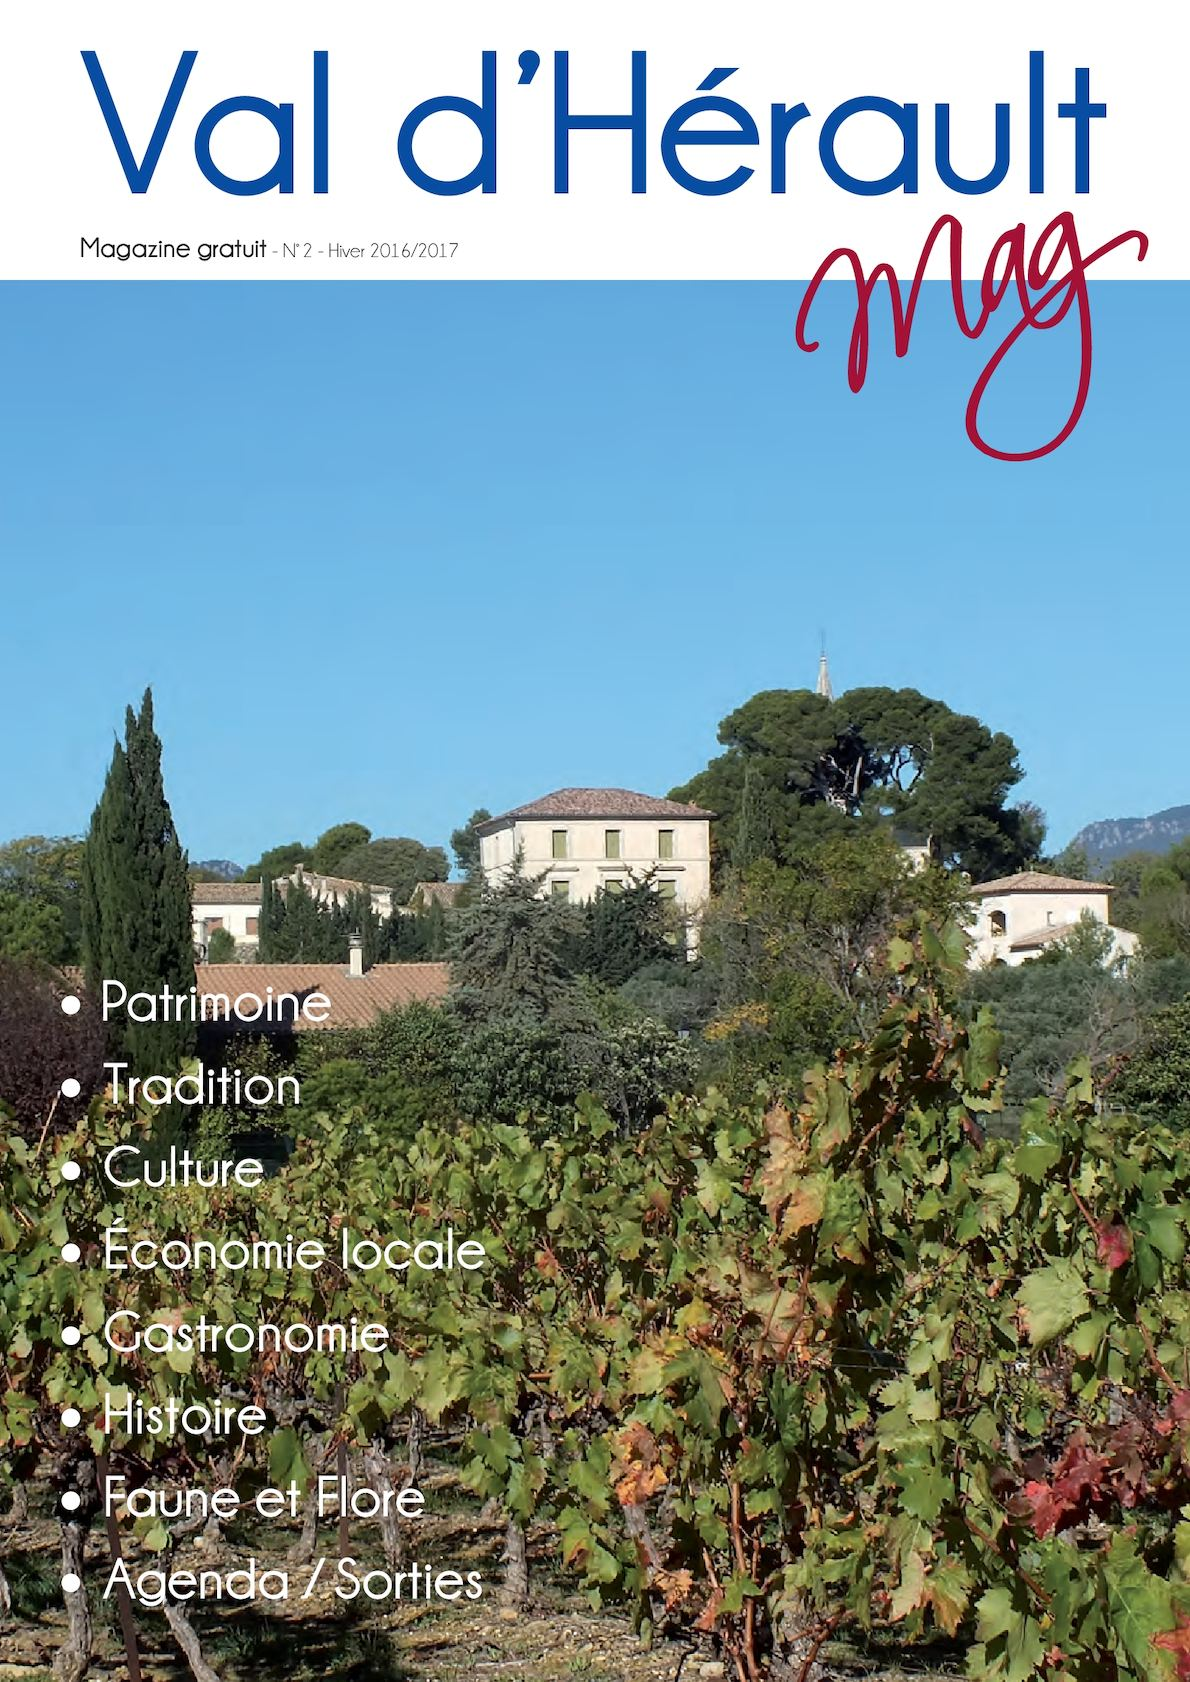 Calaméo - Val D herault Mag Hiver 2016 2017 1697f8a0722